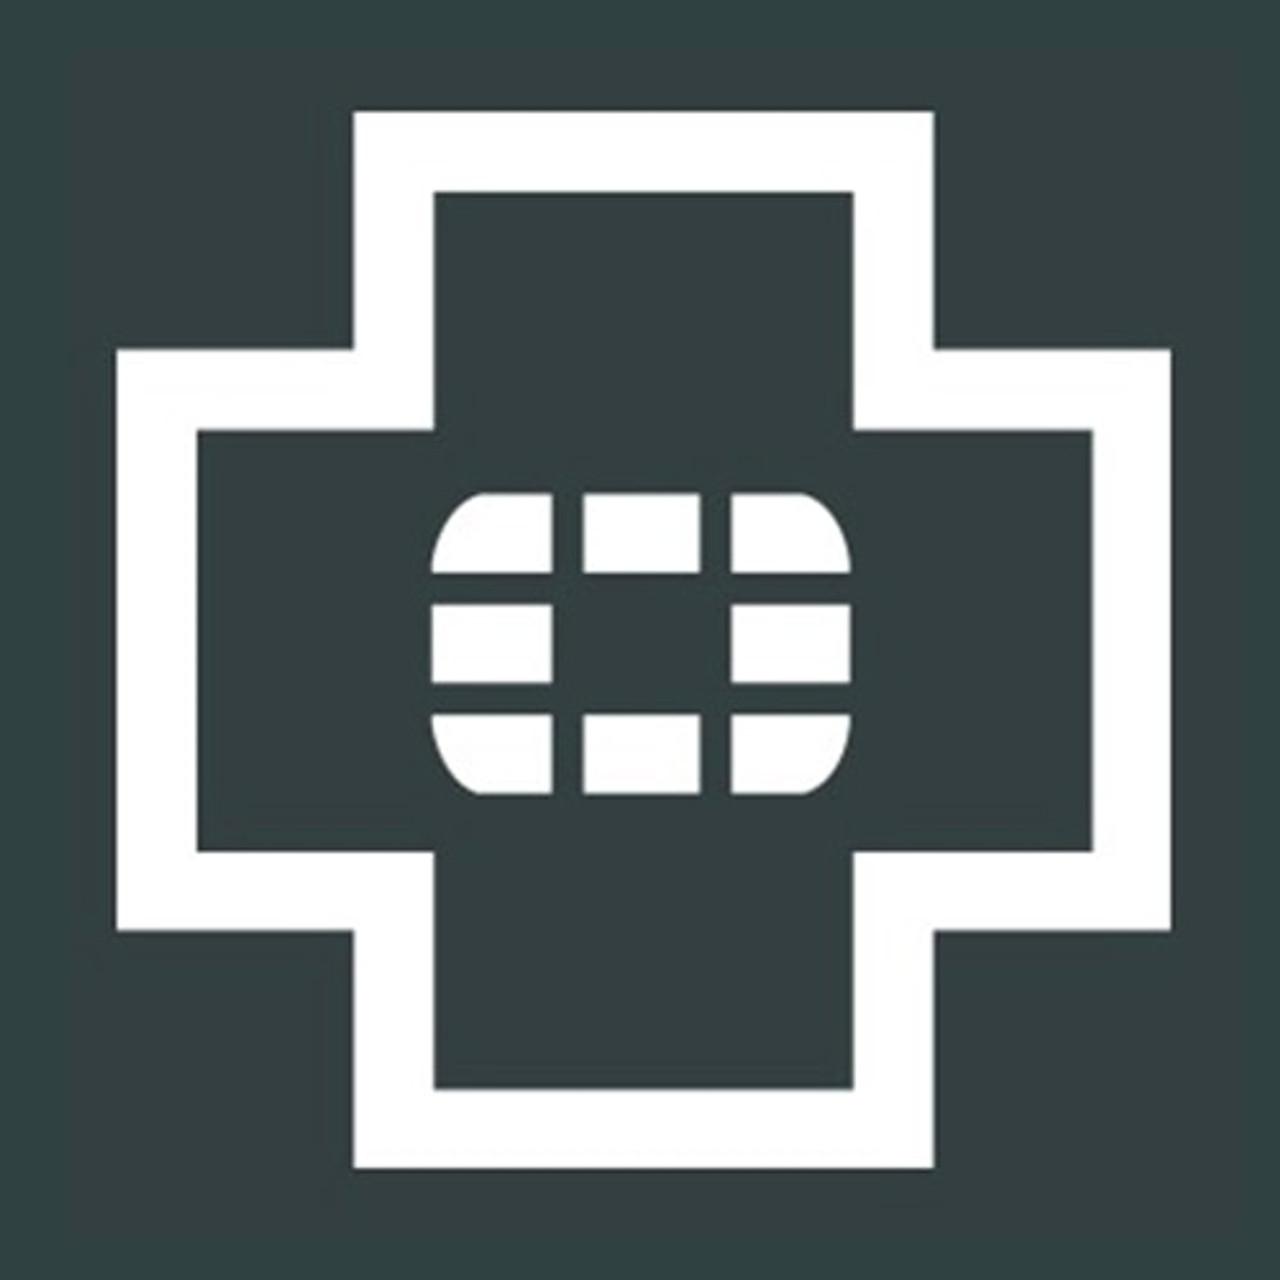 FortiGate-30E - 24x7 FortiCare Contract - 36 months